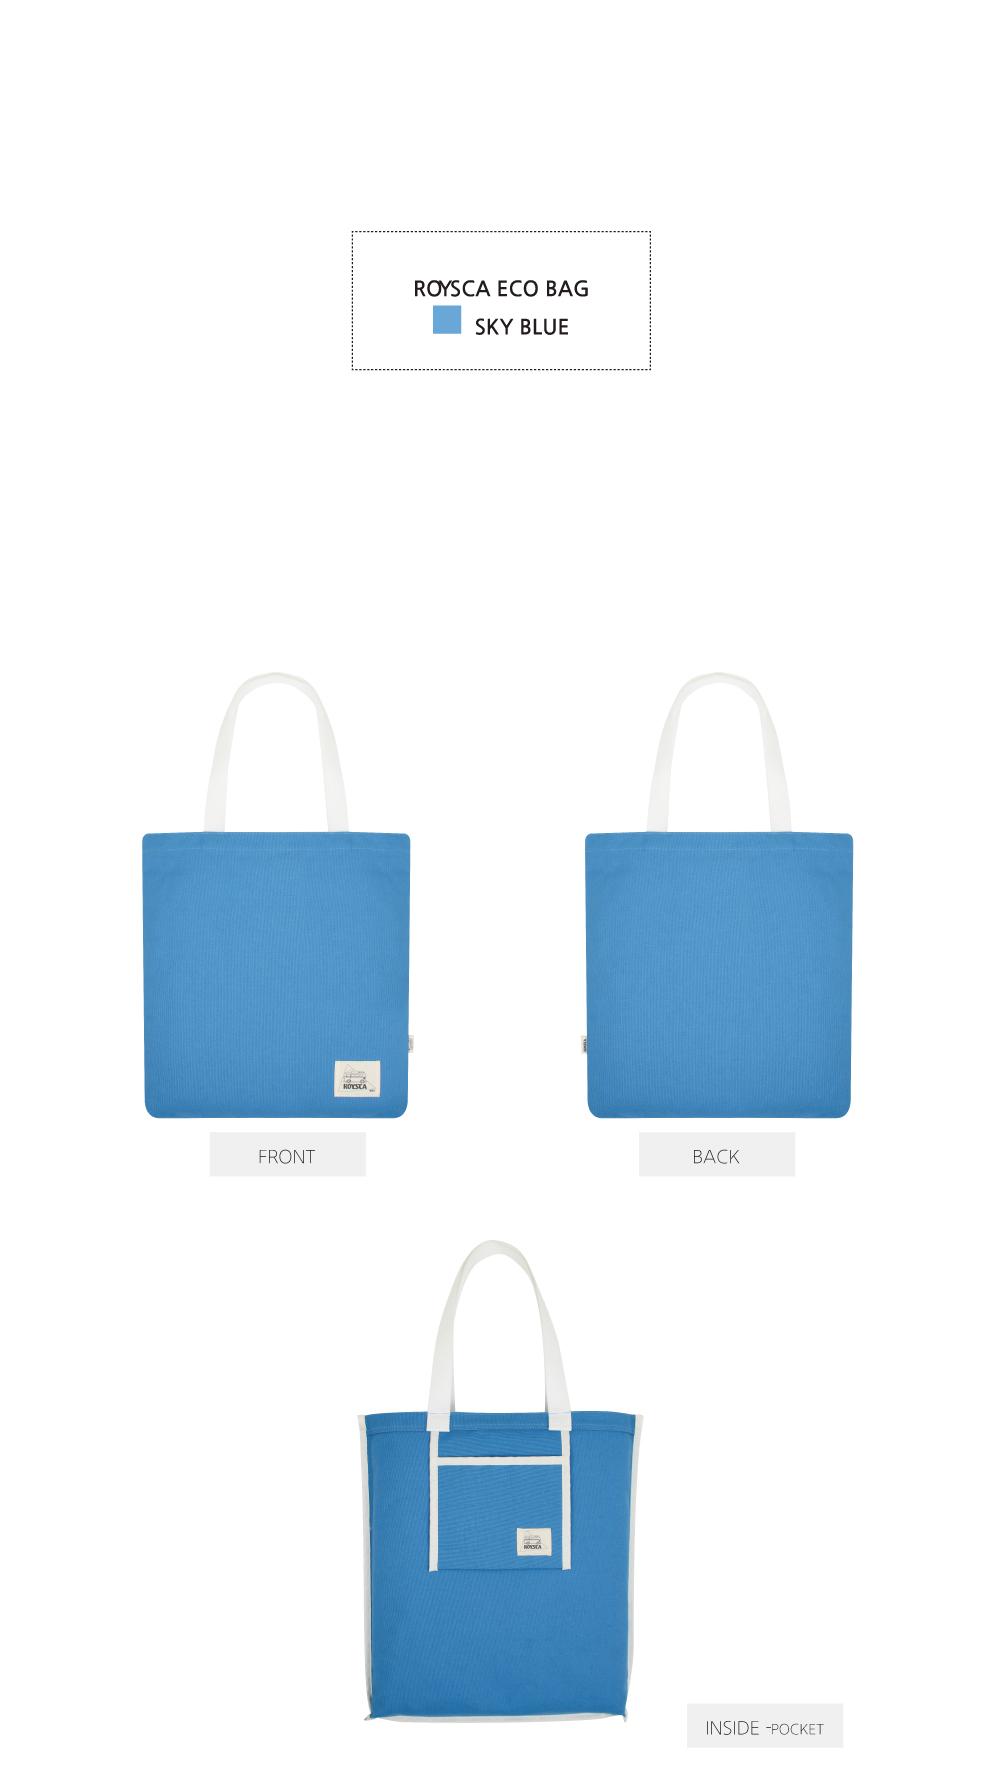 BASIC ECO BAG SKY BLUE - 로이스카, 12,900원, 캔버스/에코백, 에코백